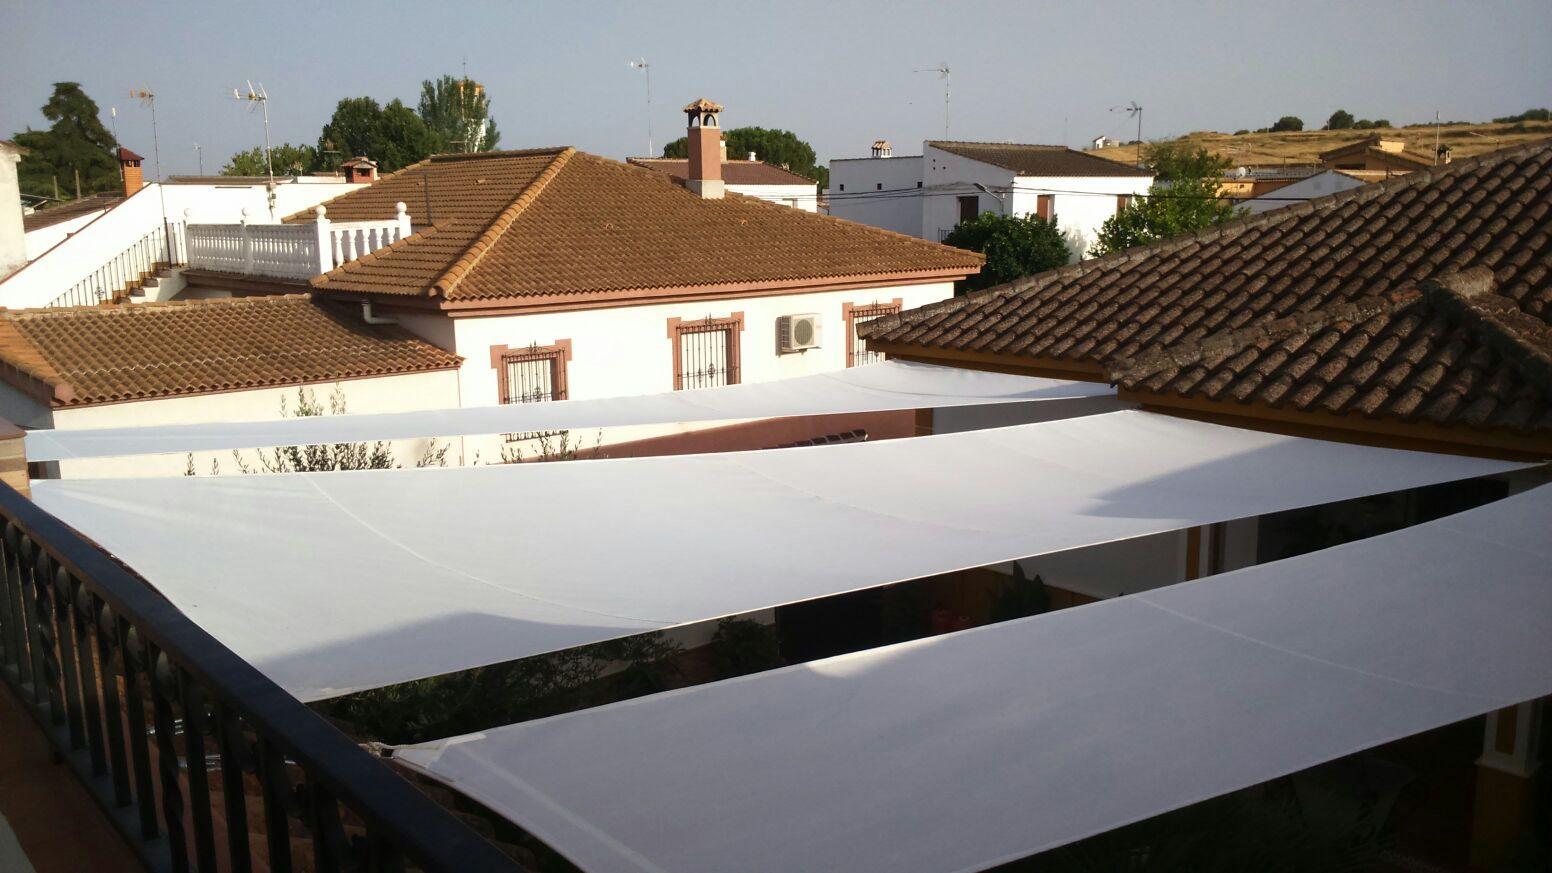 Toldos y pérgolas en Córdoba